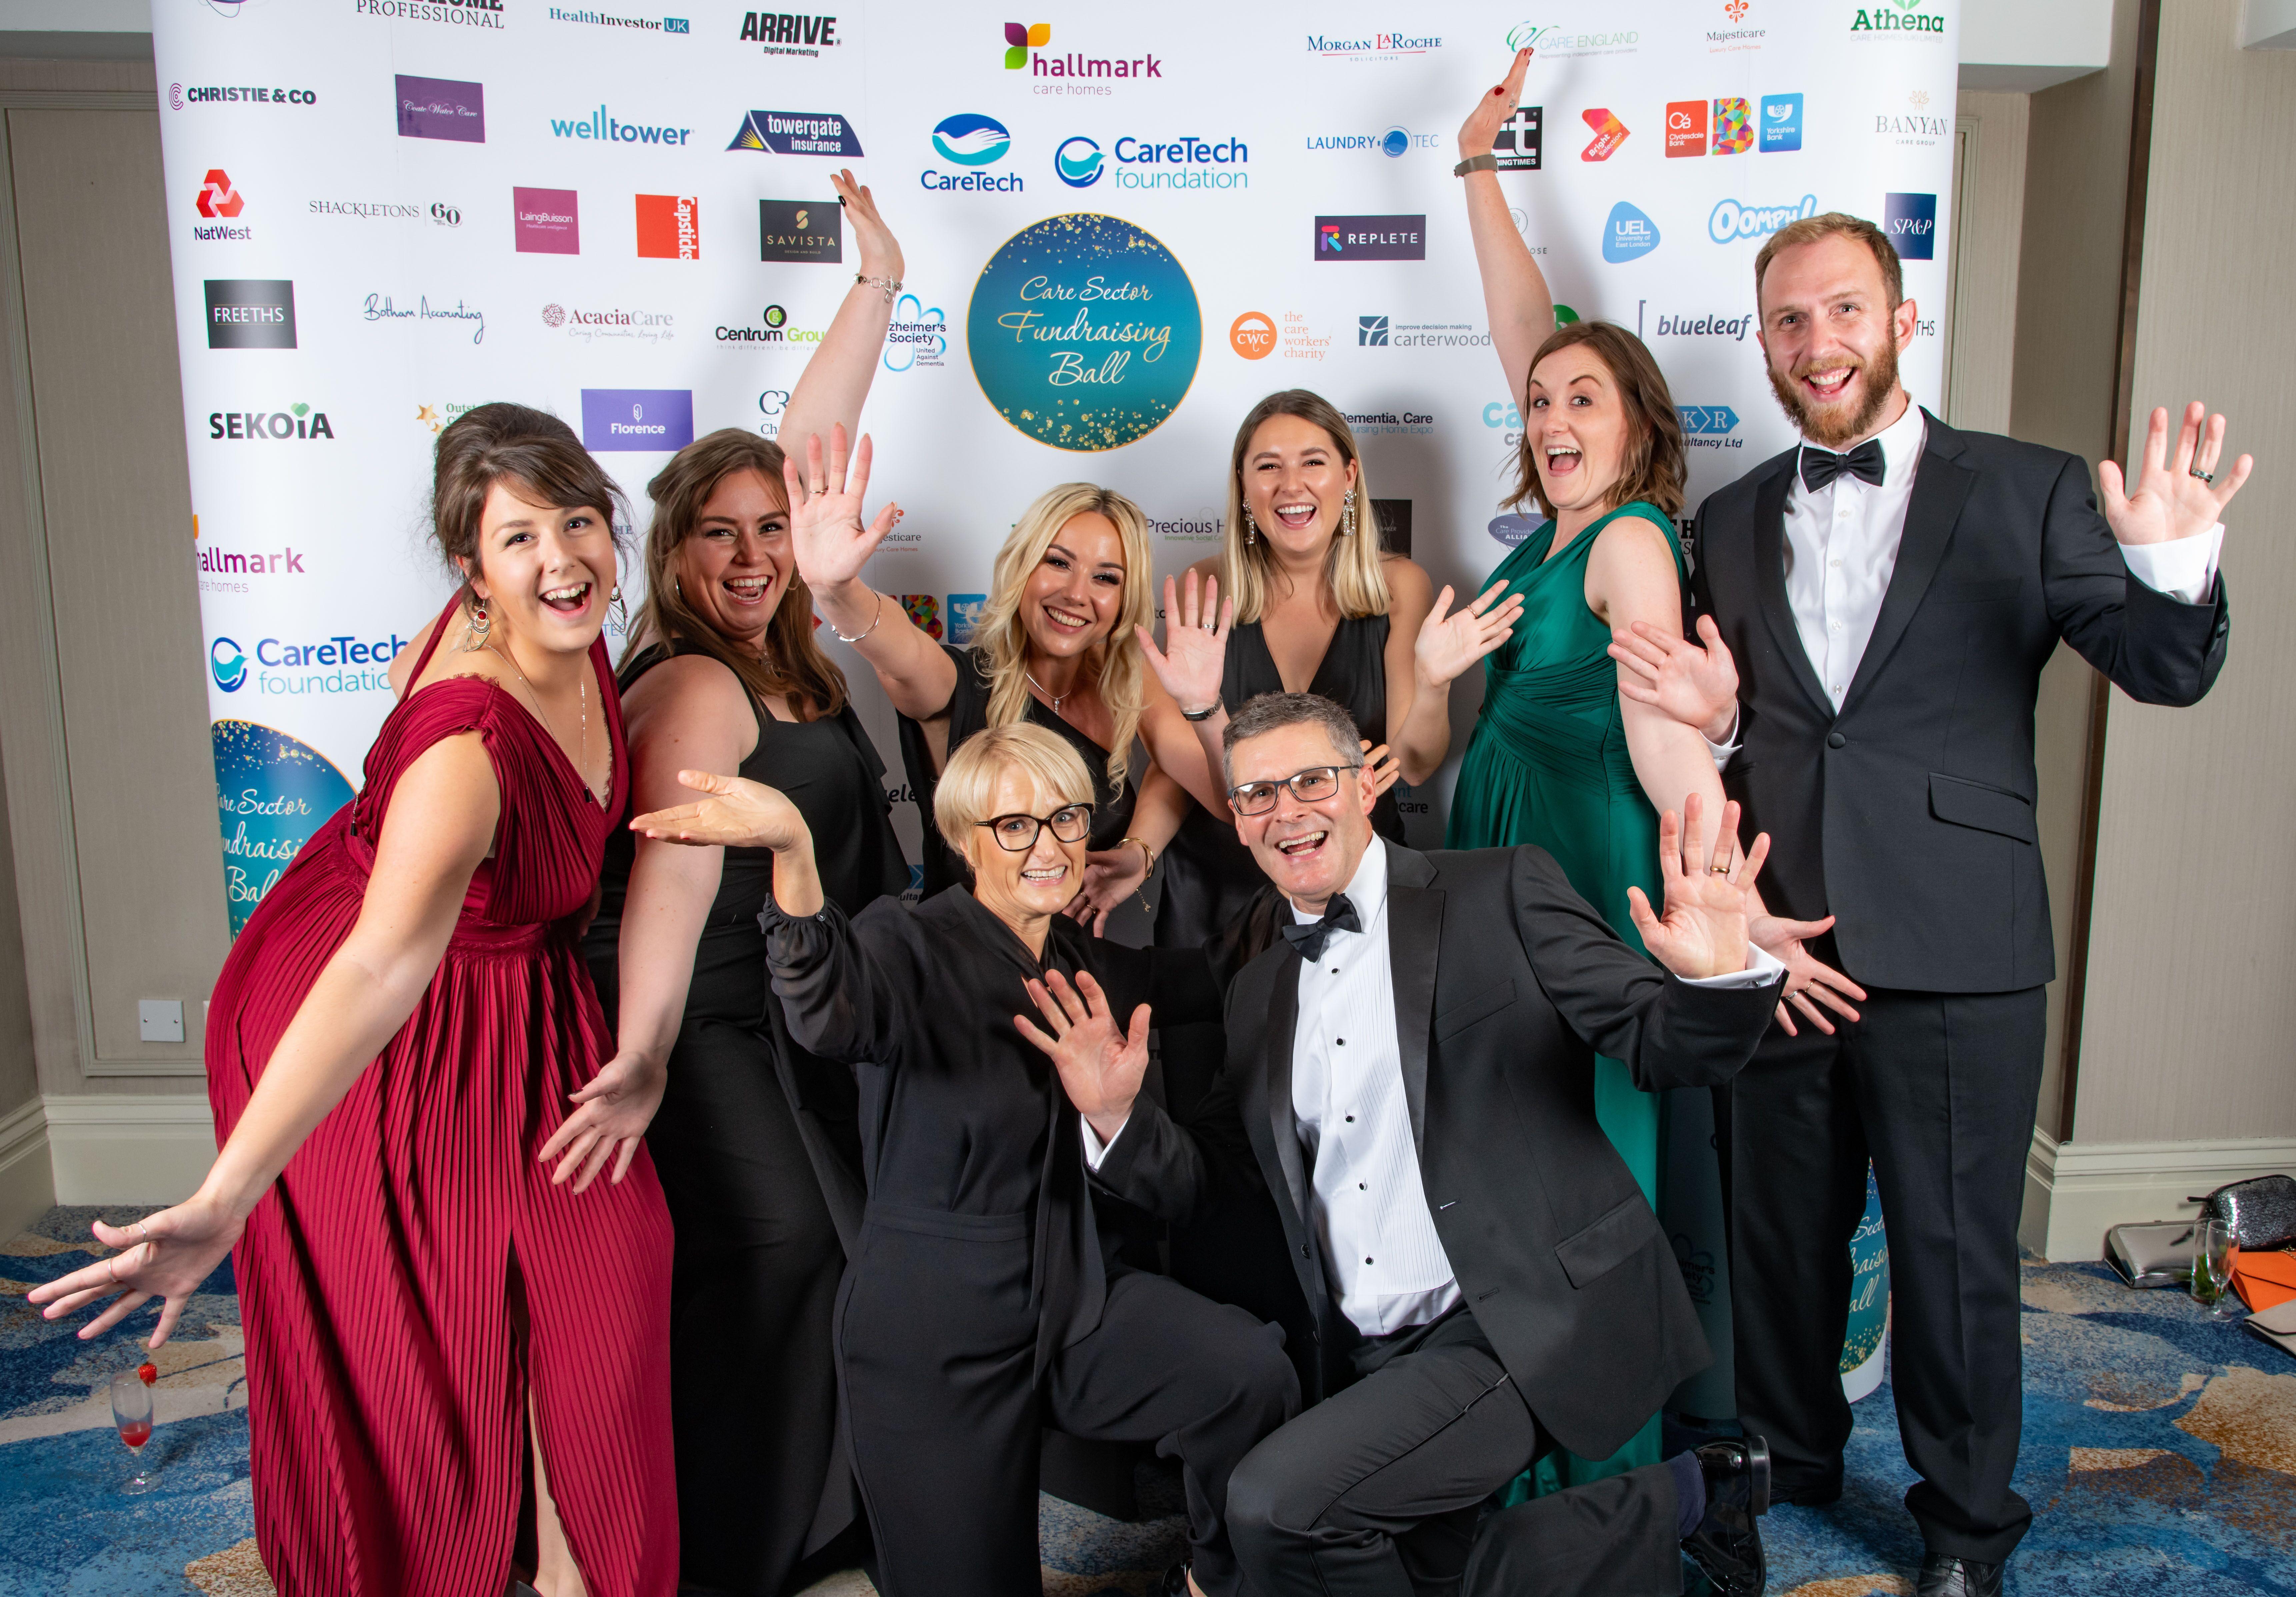 Amanda Nurse shortlisted for HealthInvestor Power 50 Awards